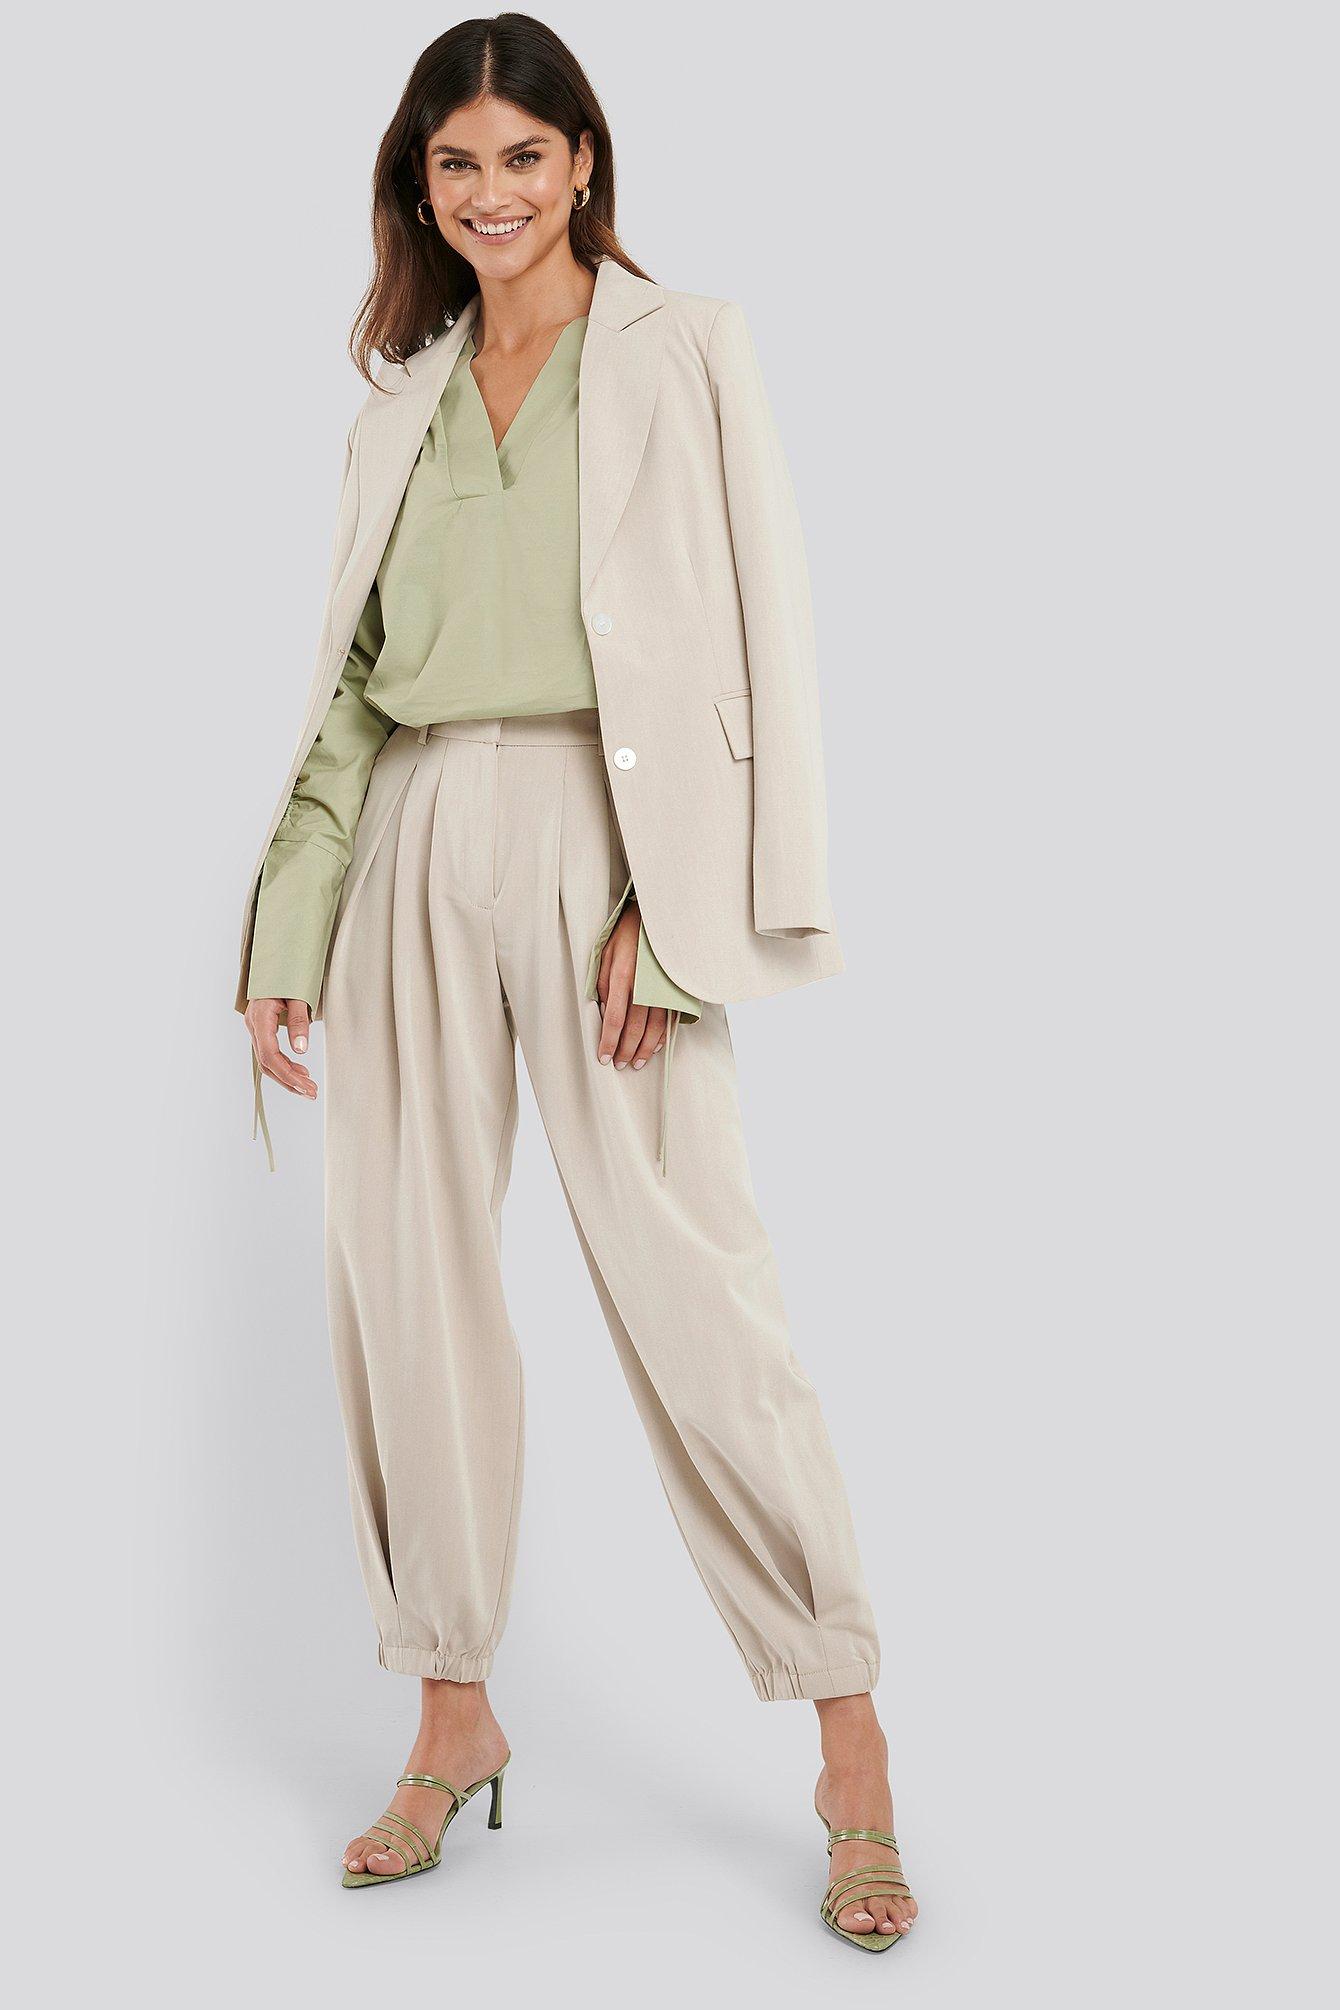 na-kd classic -  Cocoon Elastic Suit Pants - Beige